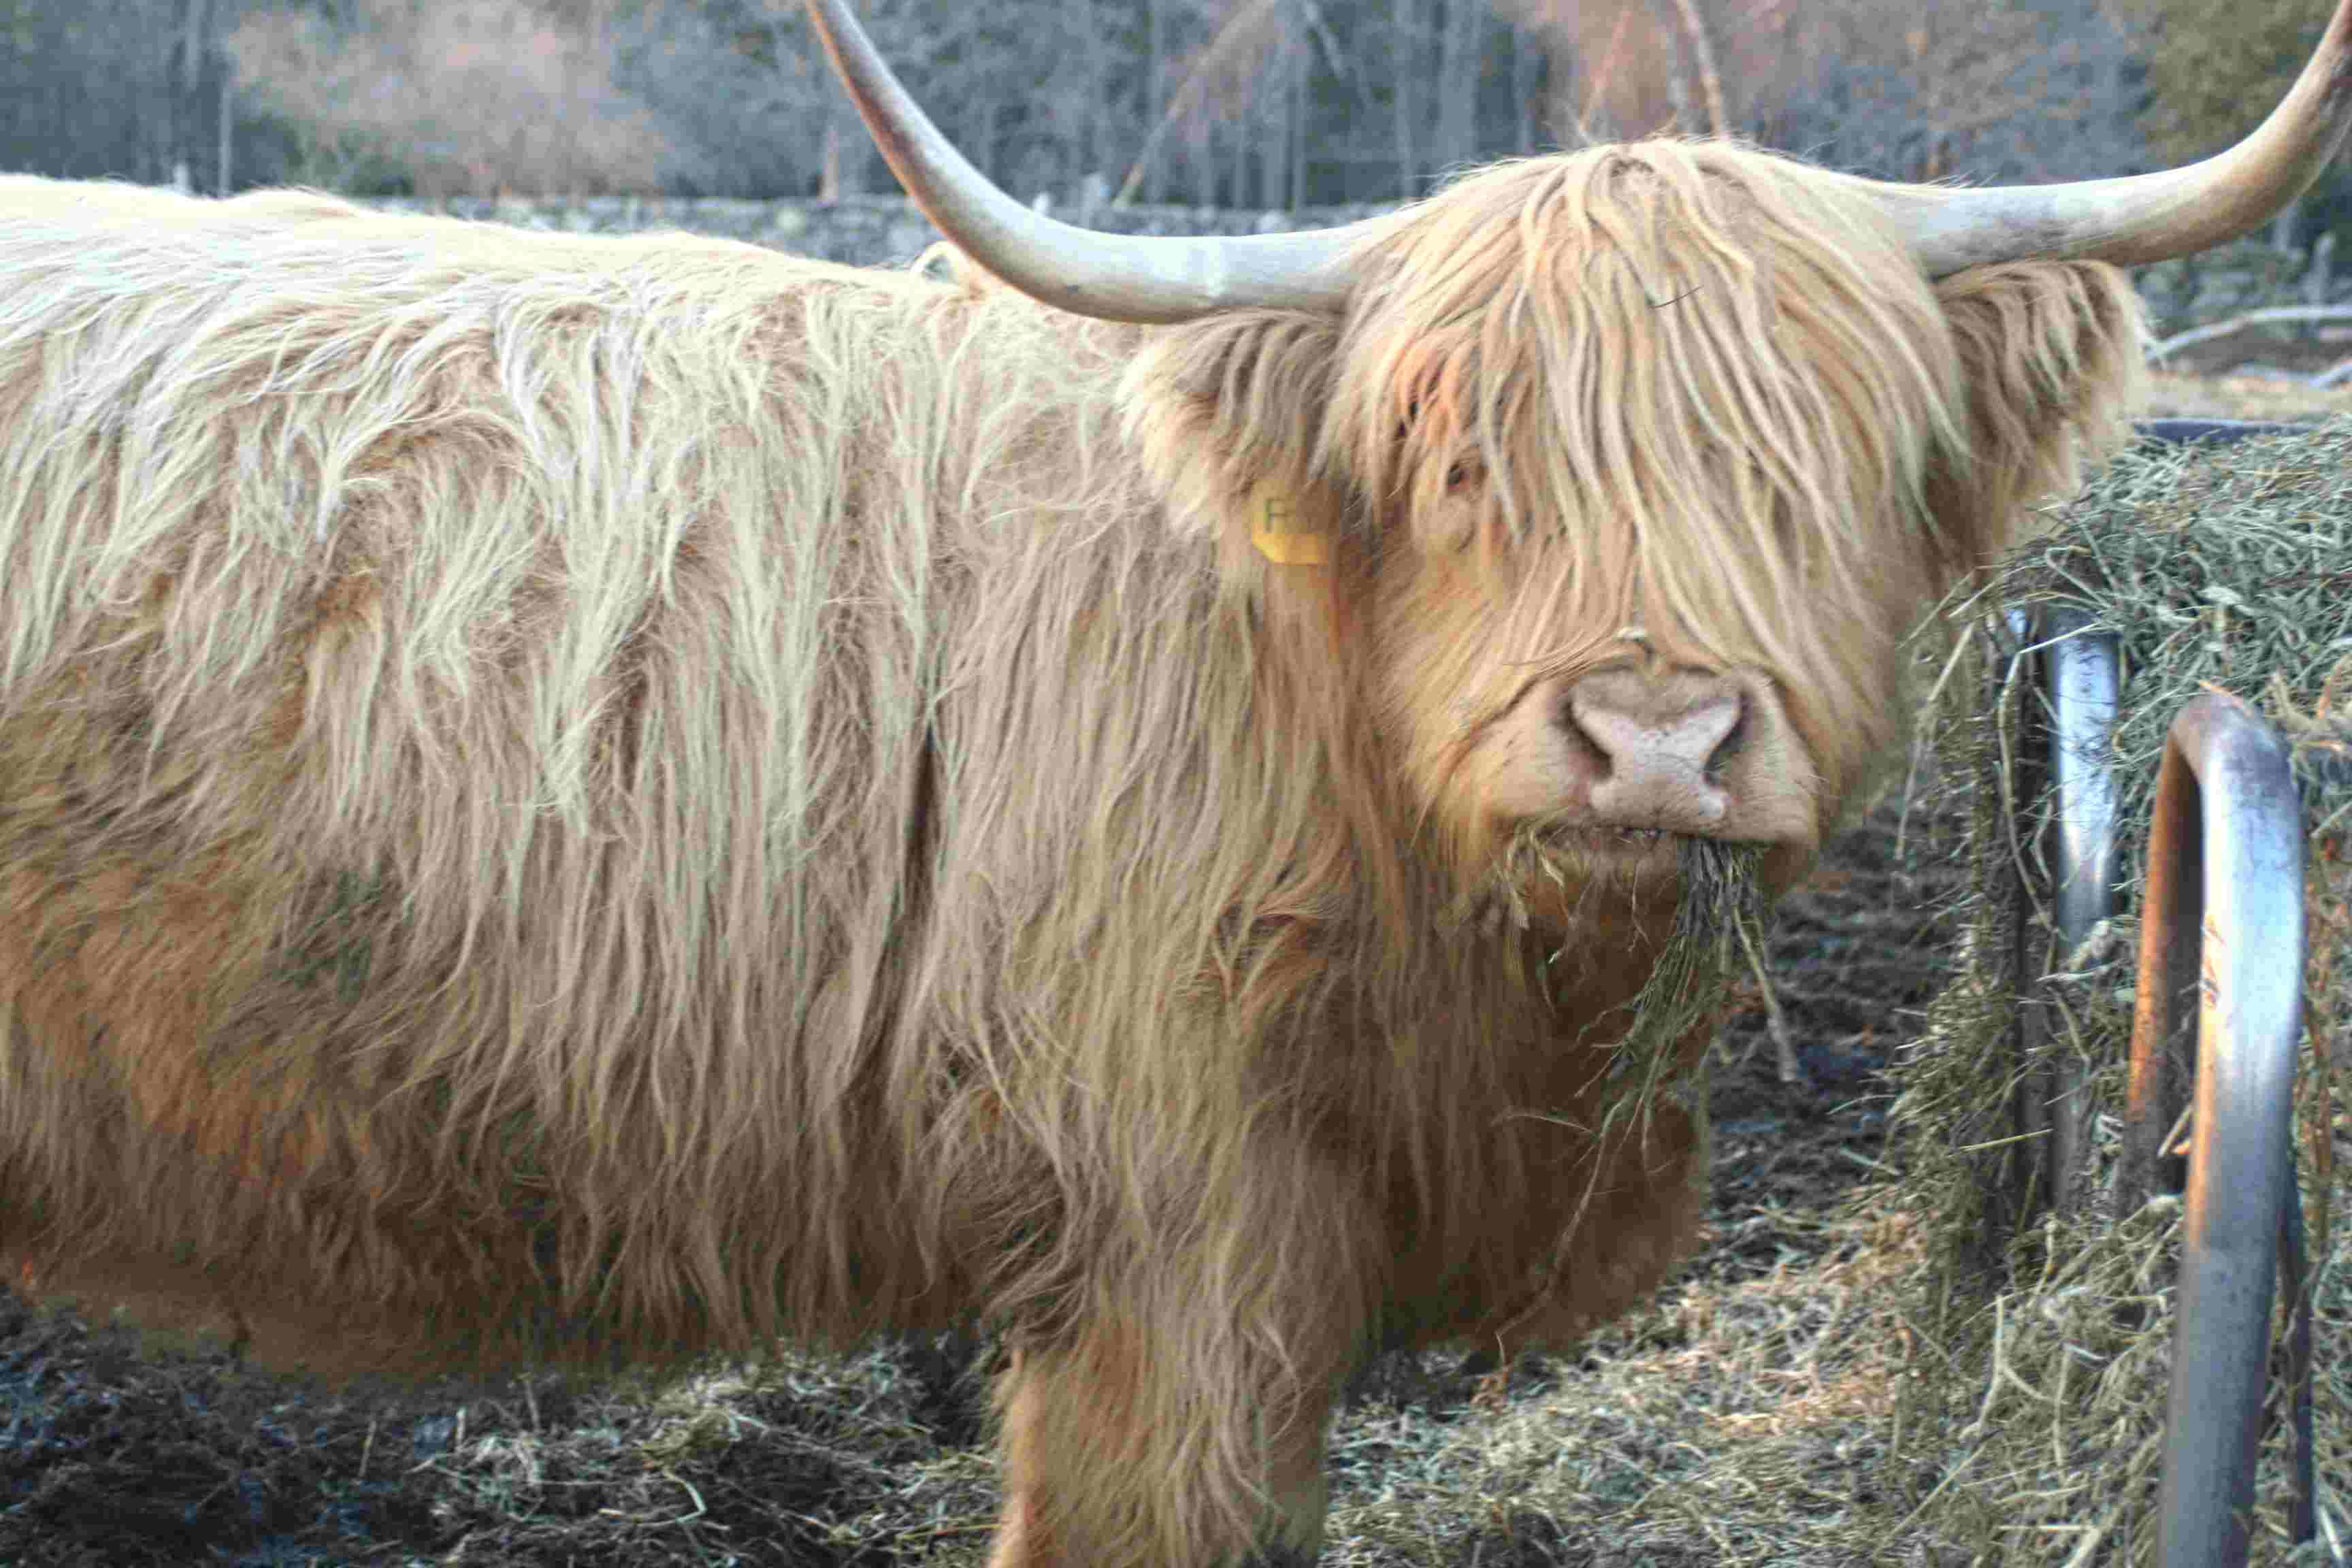 Francine's Calf - Due in May, 2021 - Heifer Calf will be $3400, Bull Calf will be $1900